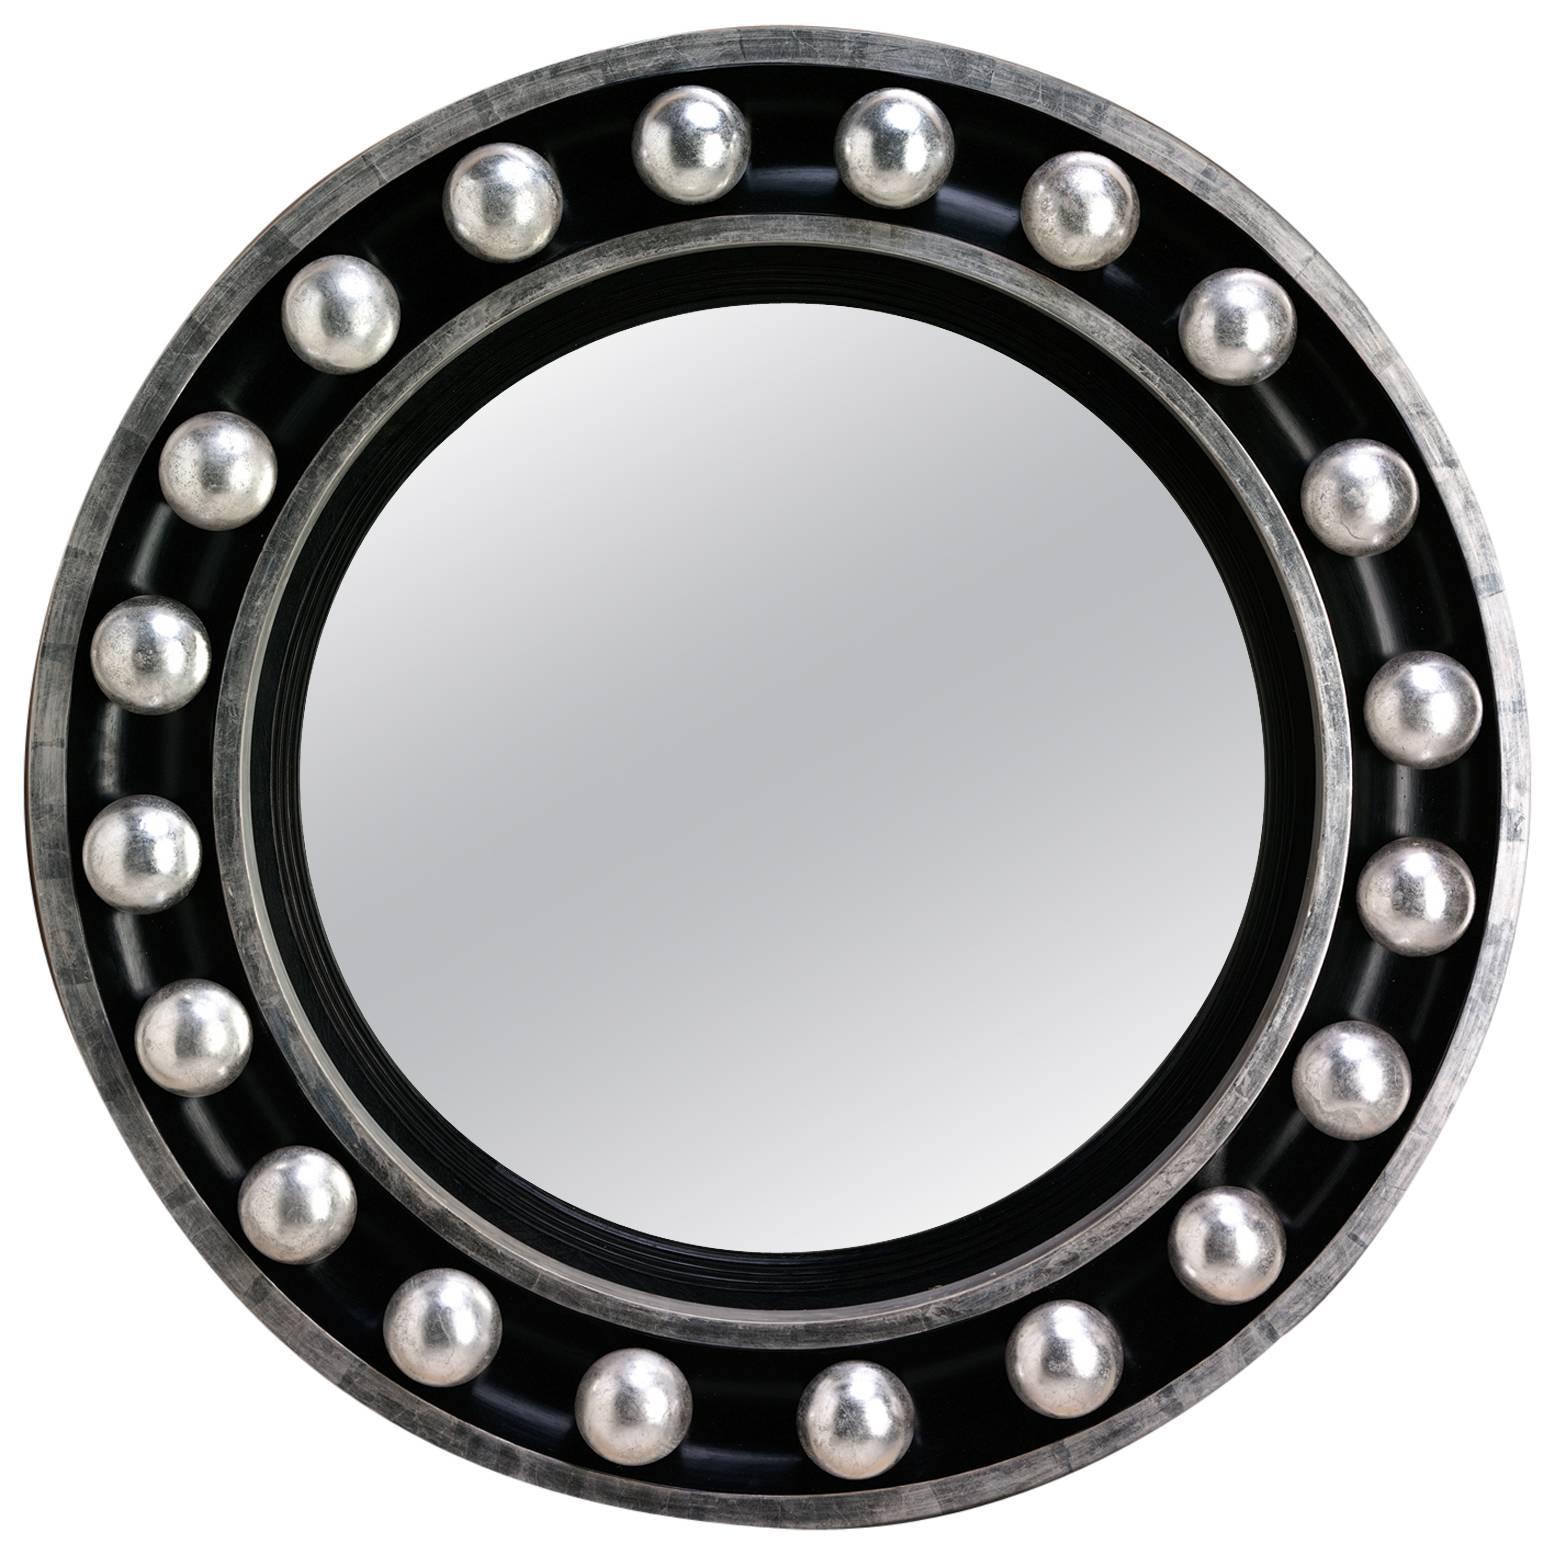 Modernist Classical Convex Mirror